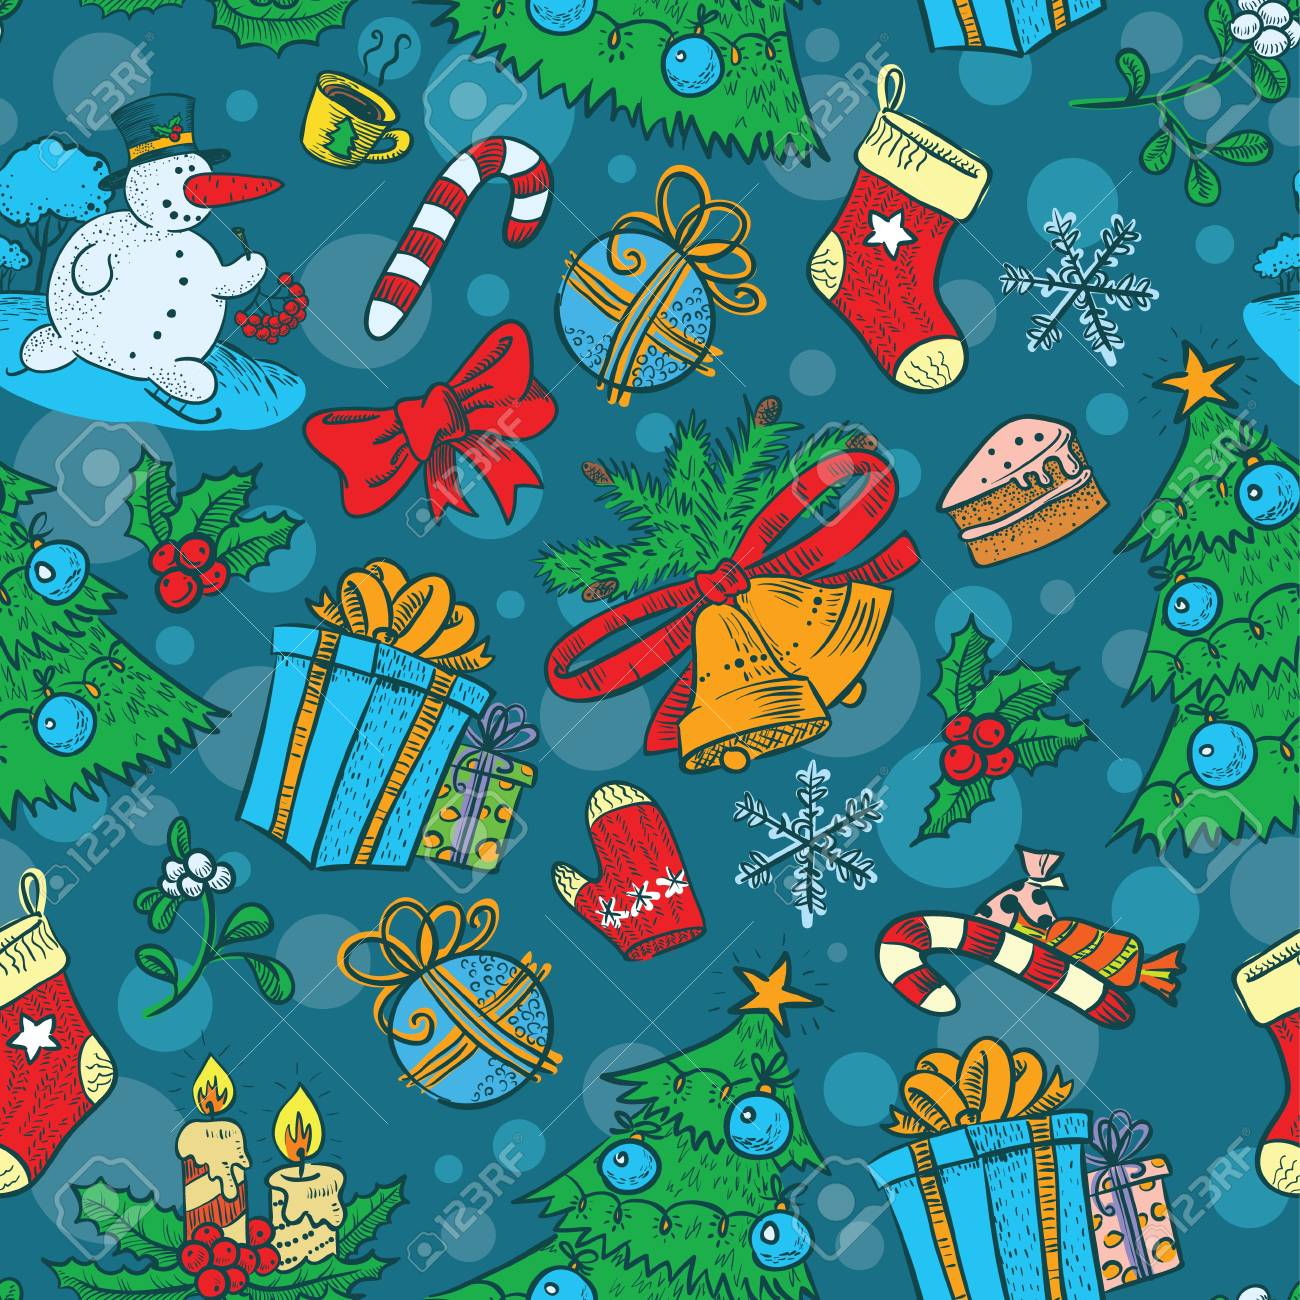 Cute Christmas seamless with Snowman Stock Vector - 16799077